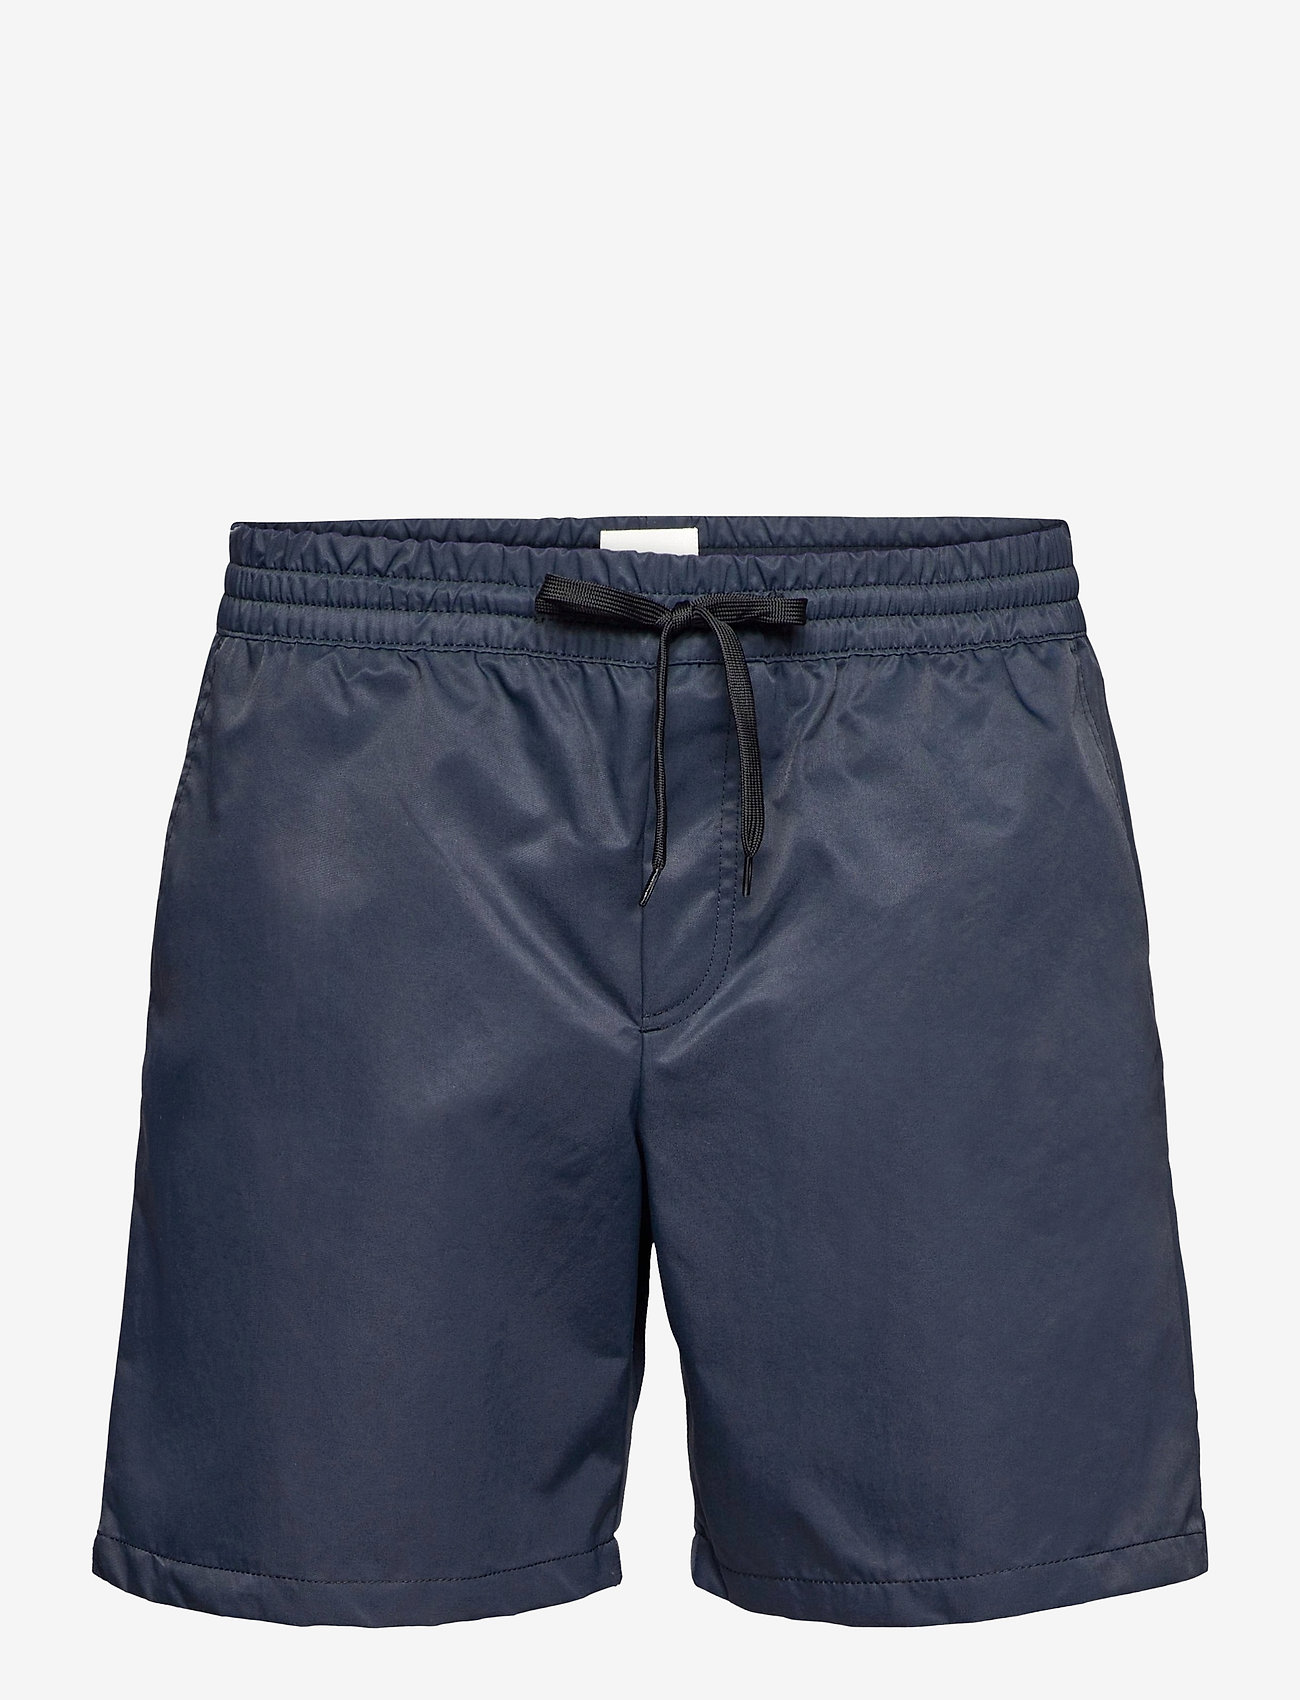 Wood Wood - Roy swim shorts - shorts de bain - navy - 0